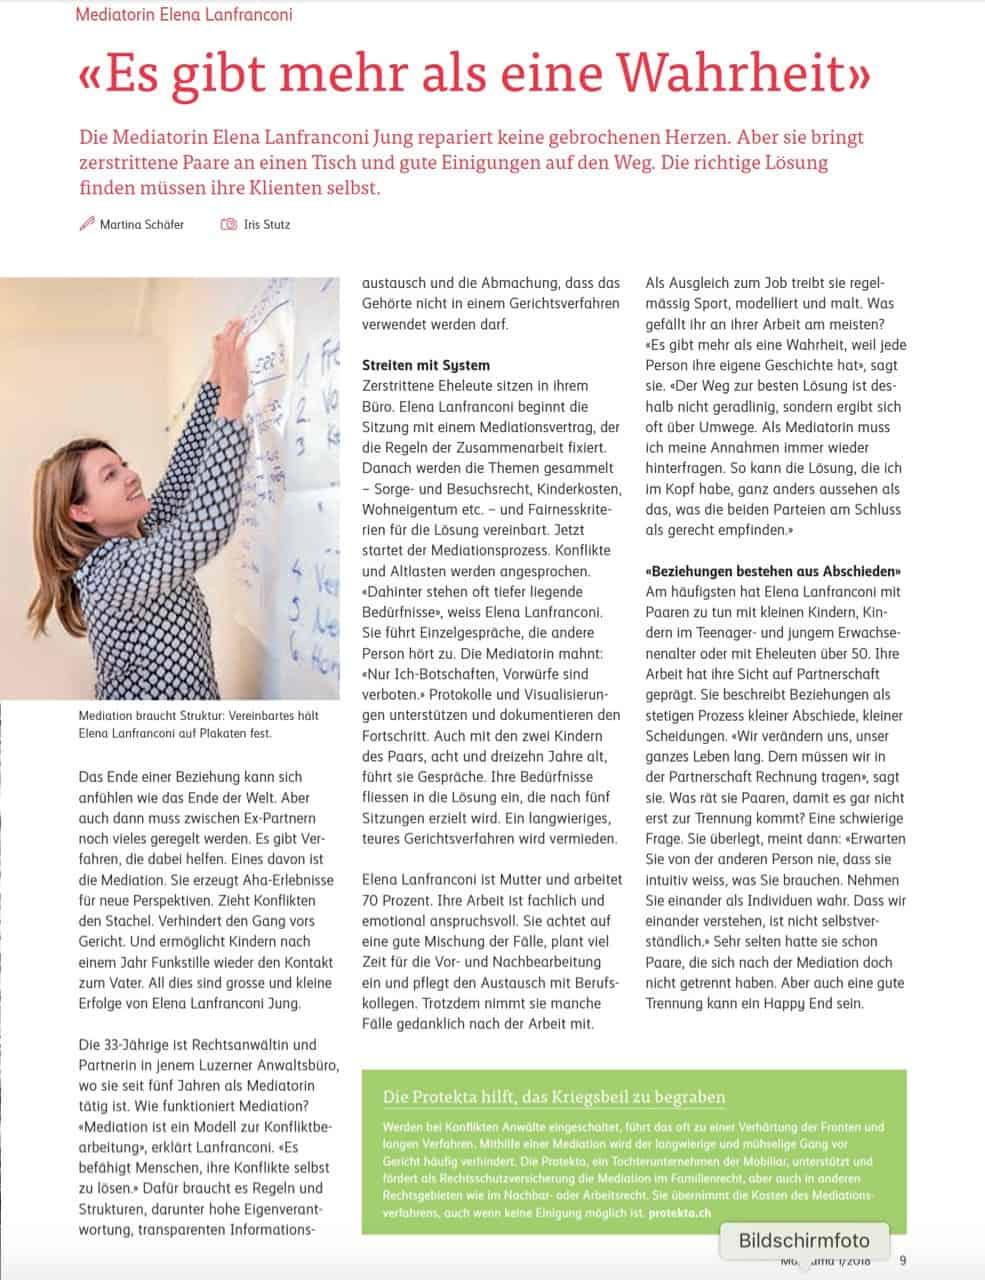 Porträt über die Mediatorin Elena Lanfranconi Jung im Kundenmagazin Mobirama, Frühling 2018